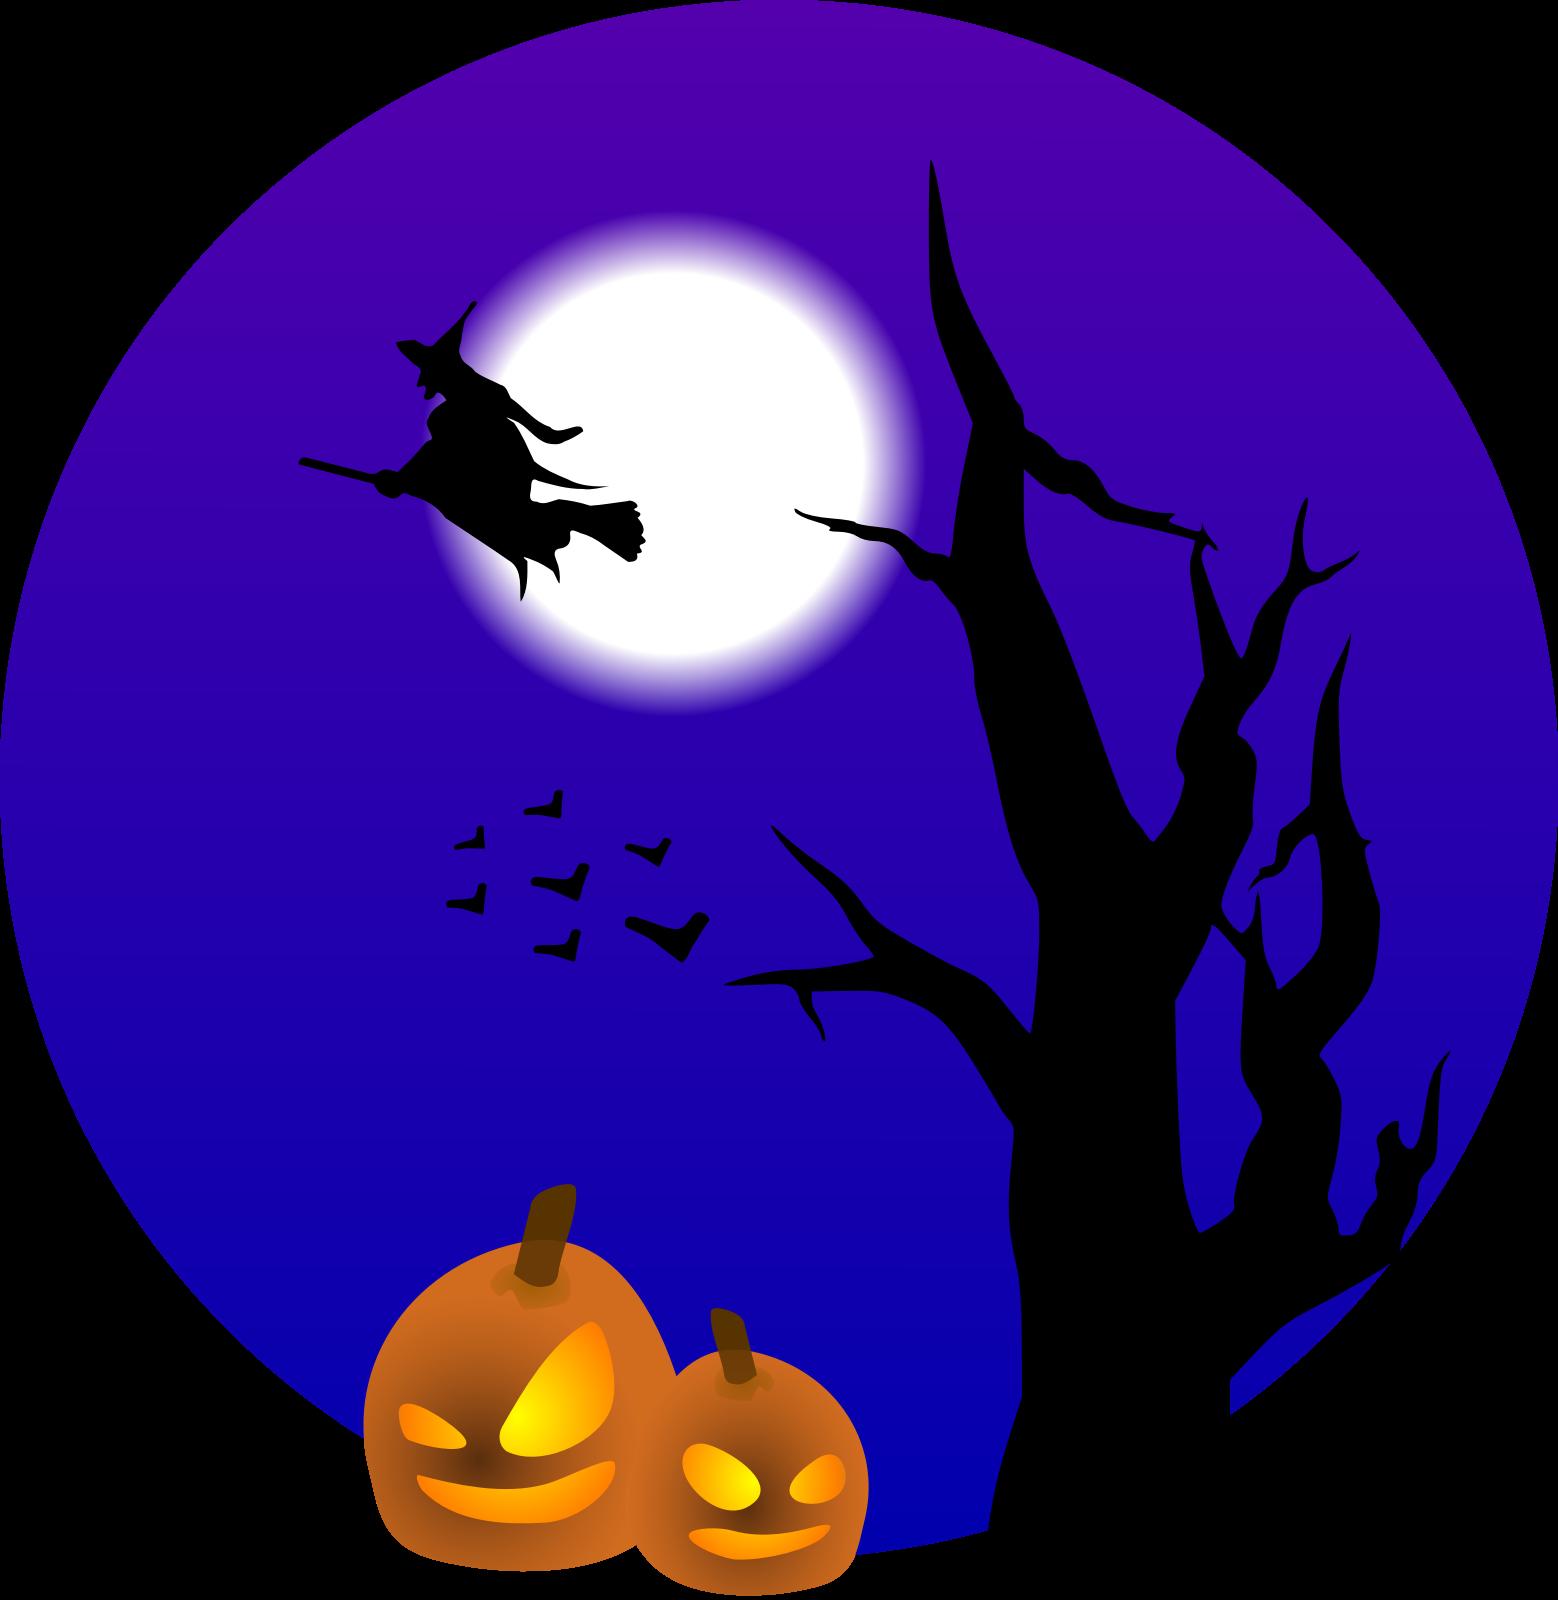 halloween pumpkins decorating ideas